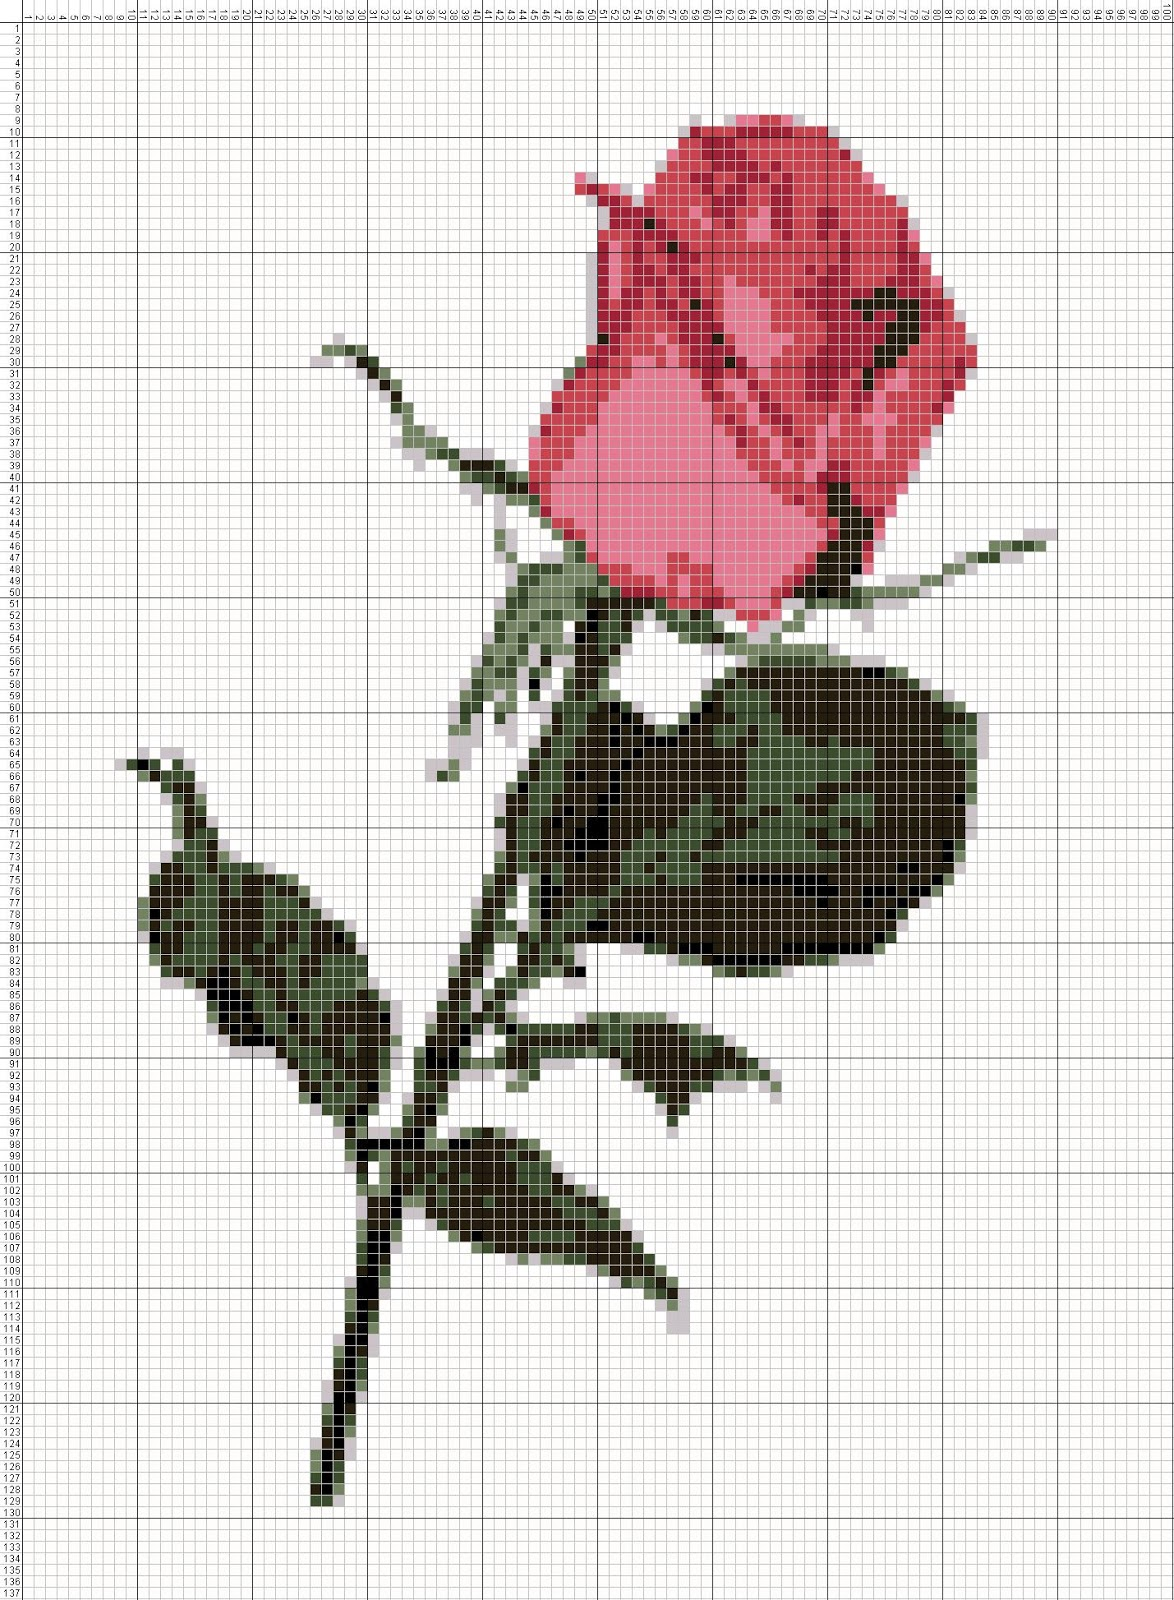 Gambar Pola Kristik Bunga Mawar Merah